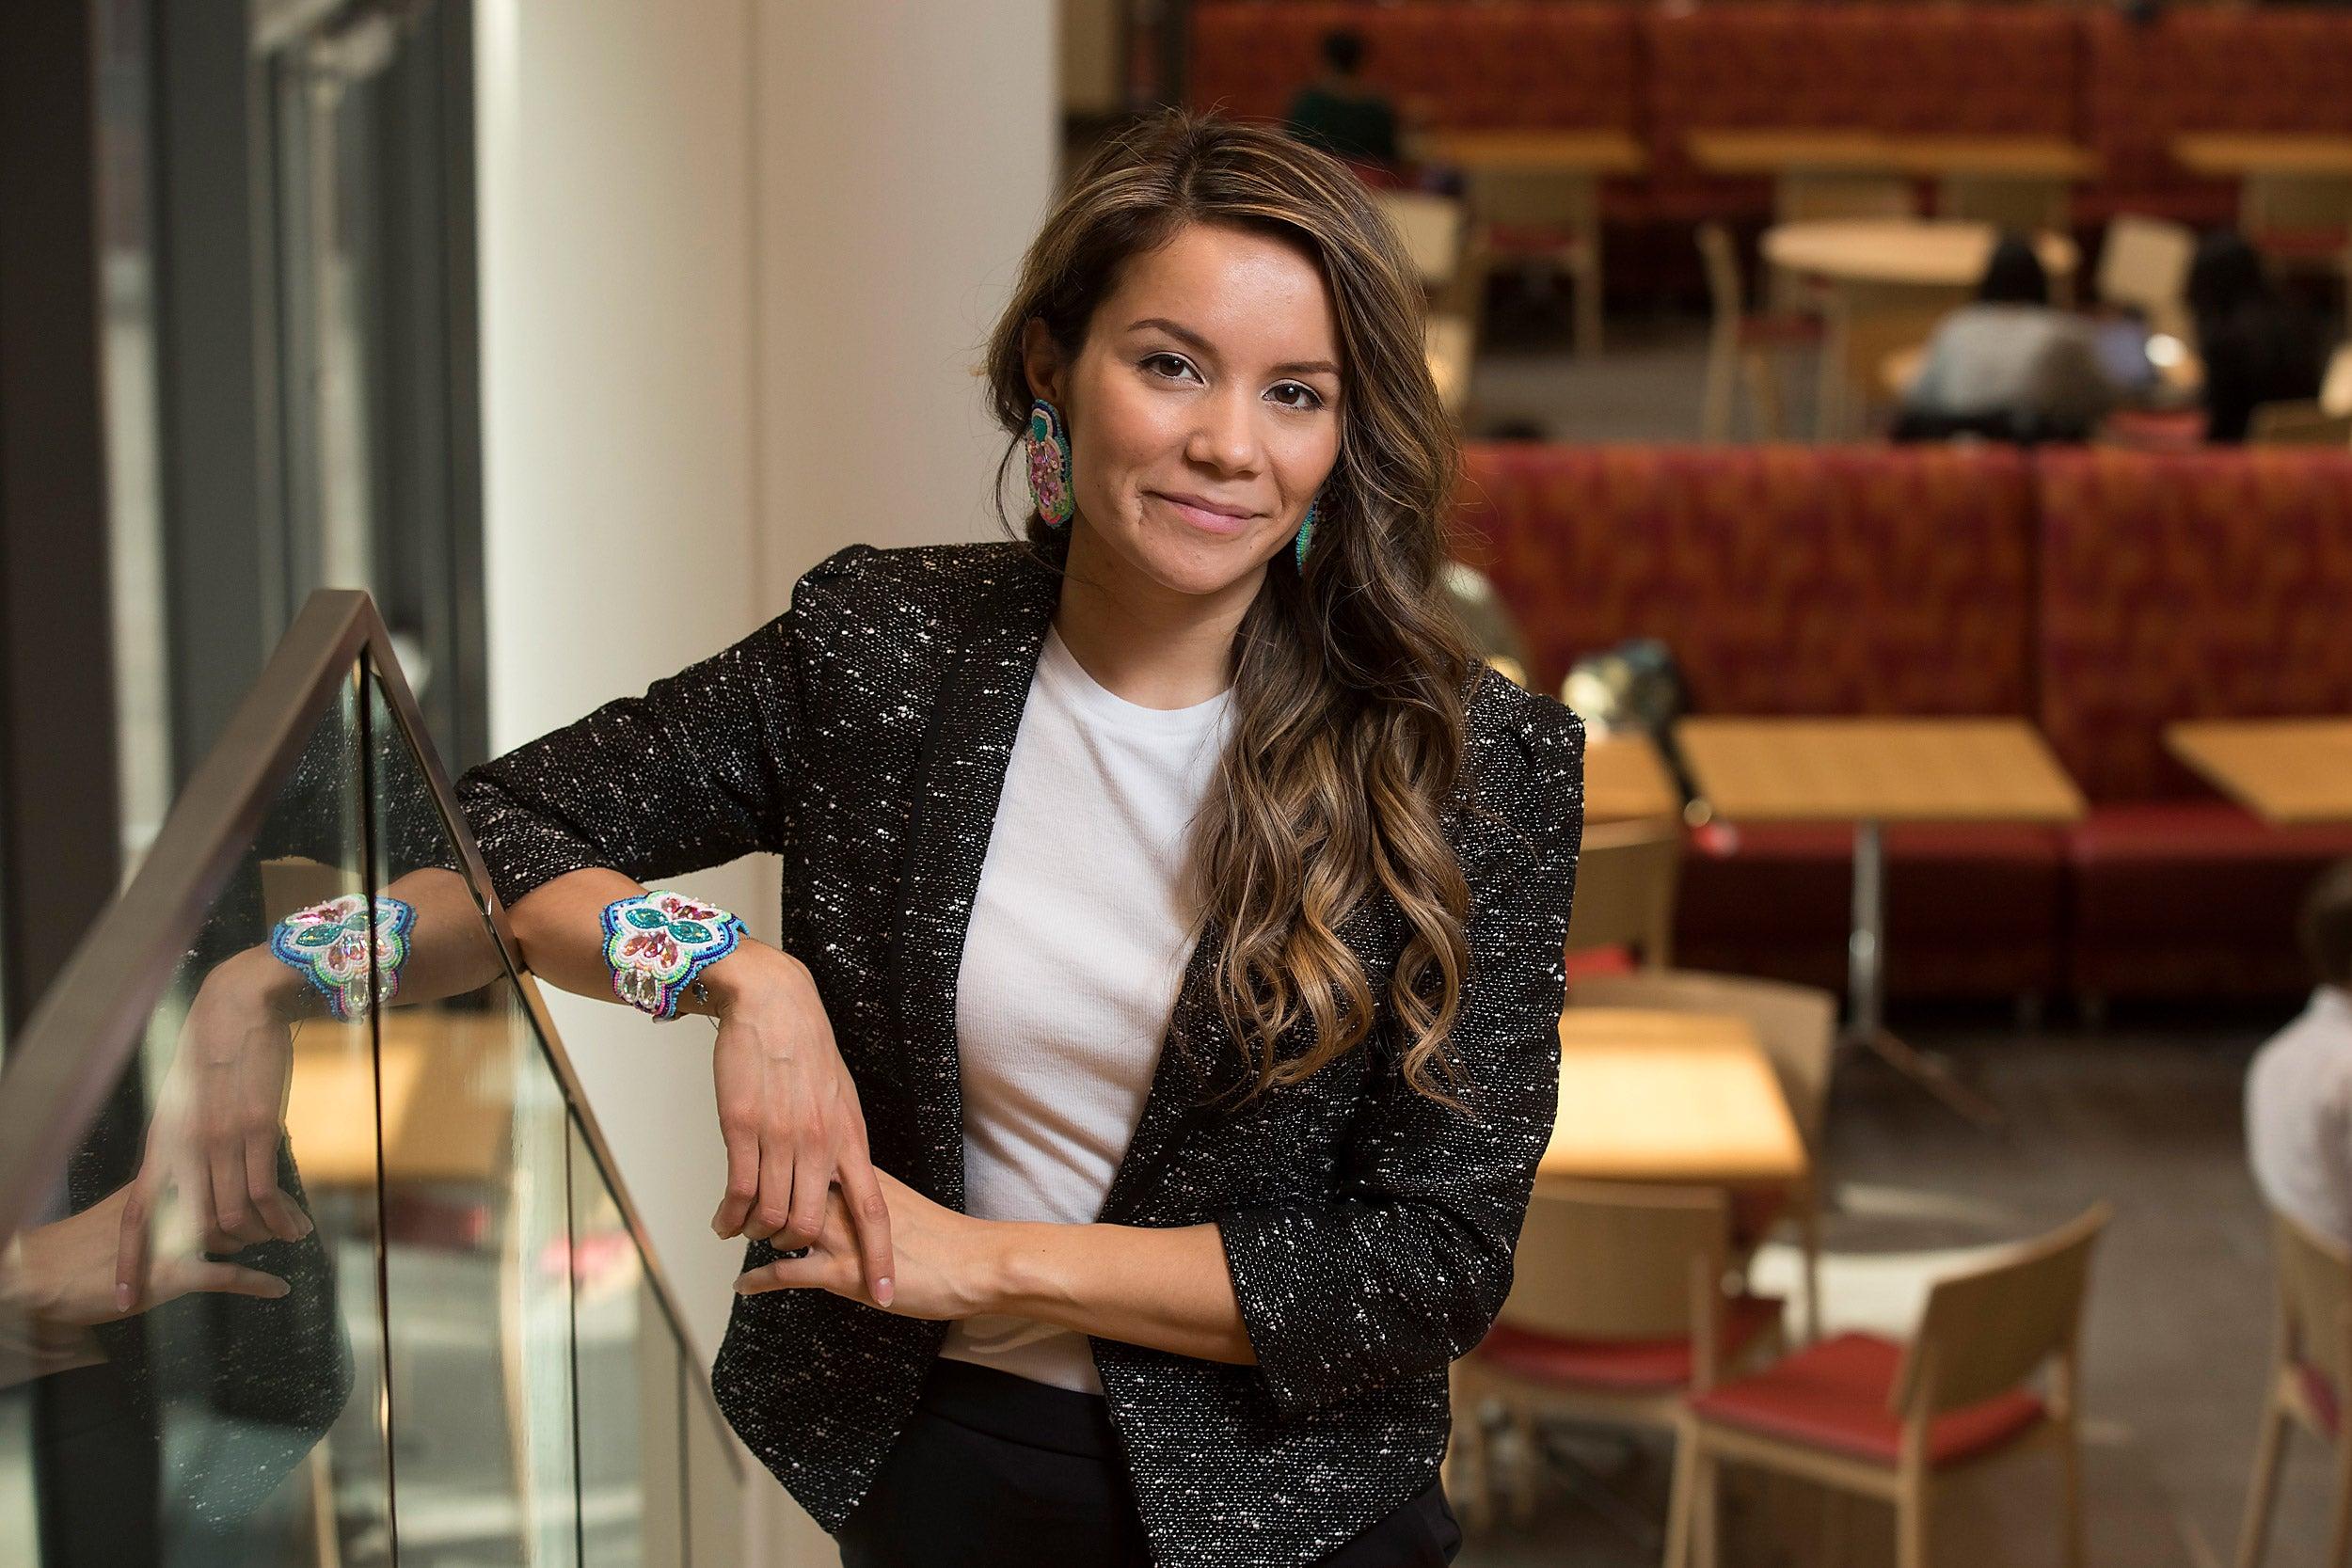 Gabrielle Scrimshaw, Gleitsman Fellow at the Harvard Kennedy School